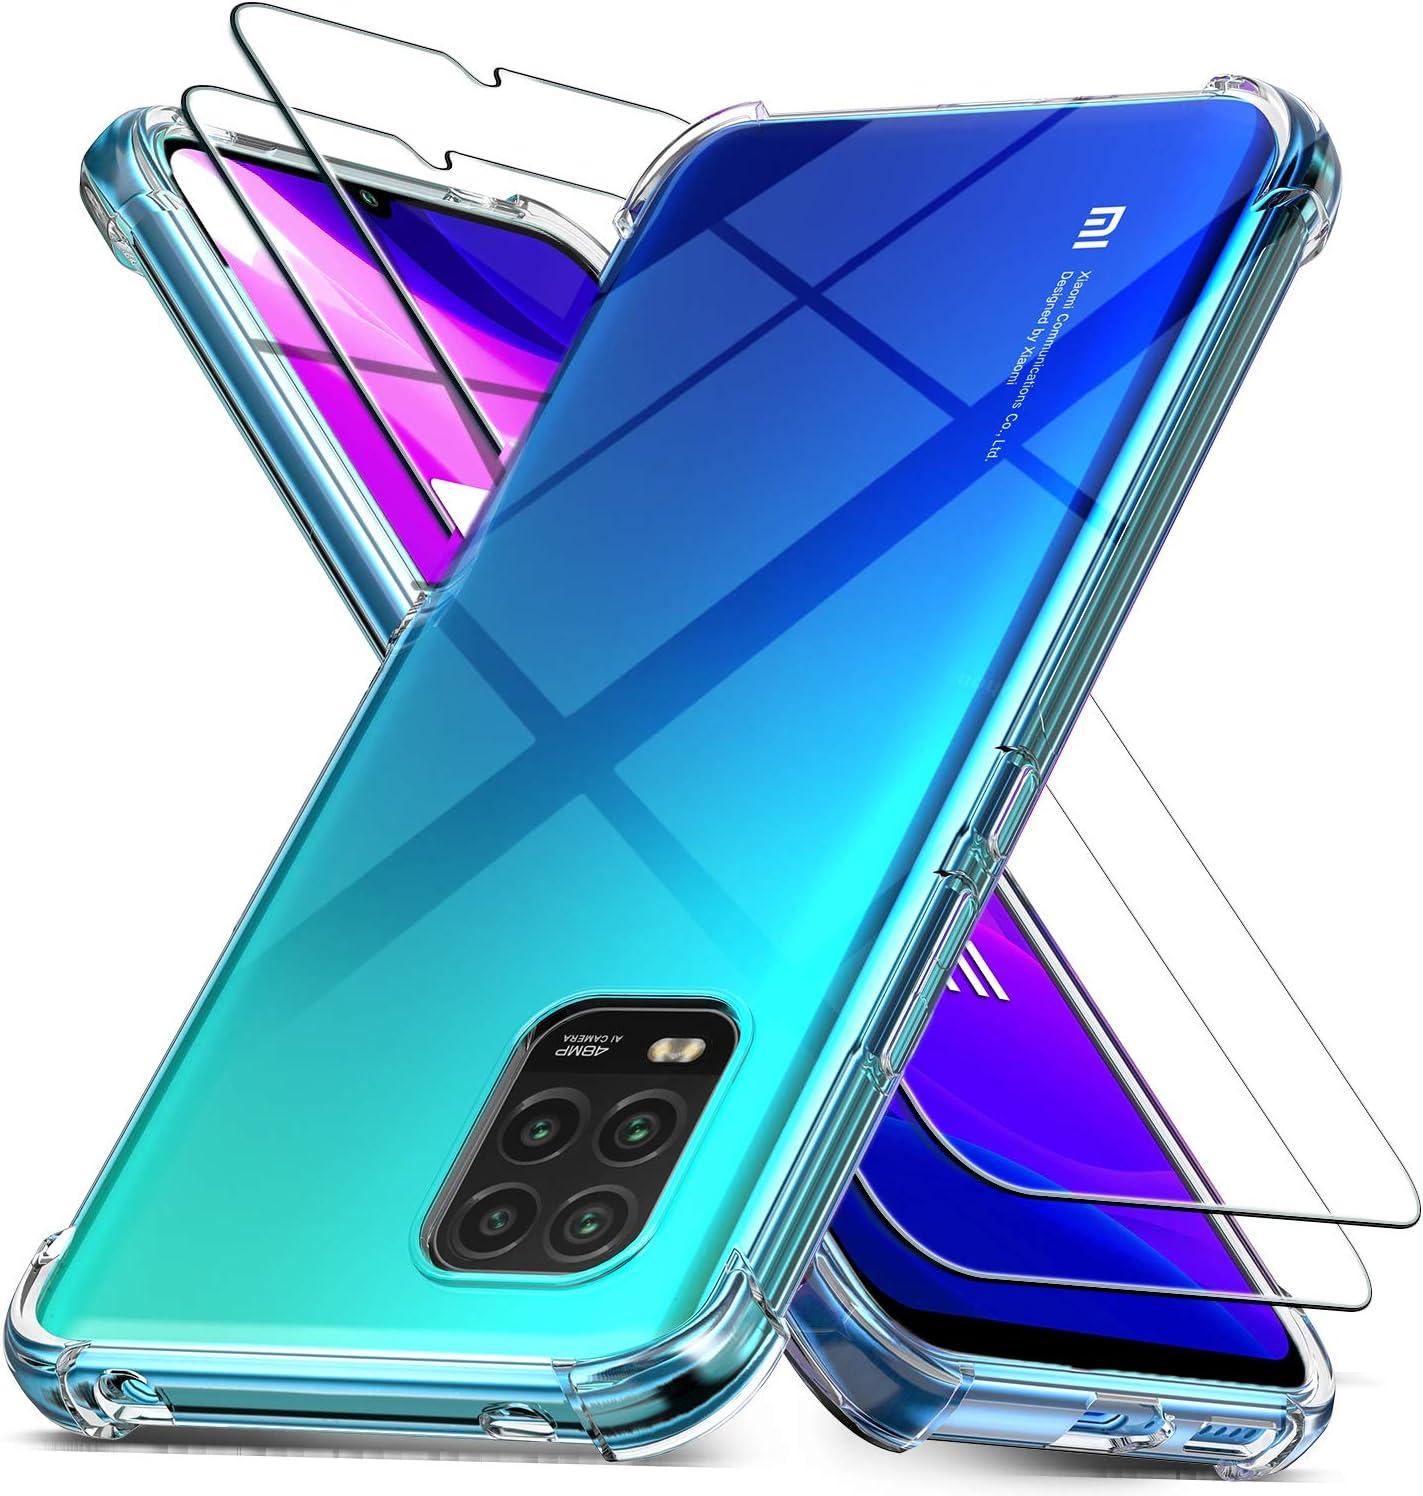 Ferilinso Fundas para Xiaomi Mi 10 Lite 5G con 2 Piezas Protector de Pantalla, Funda Transparente para Xiaomi Mi 10 Lite 5G, Película de Cristal Templado, para Xiaomi Mi 10 Lite 5G